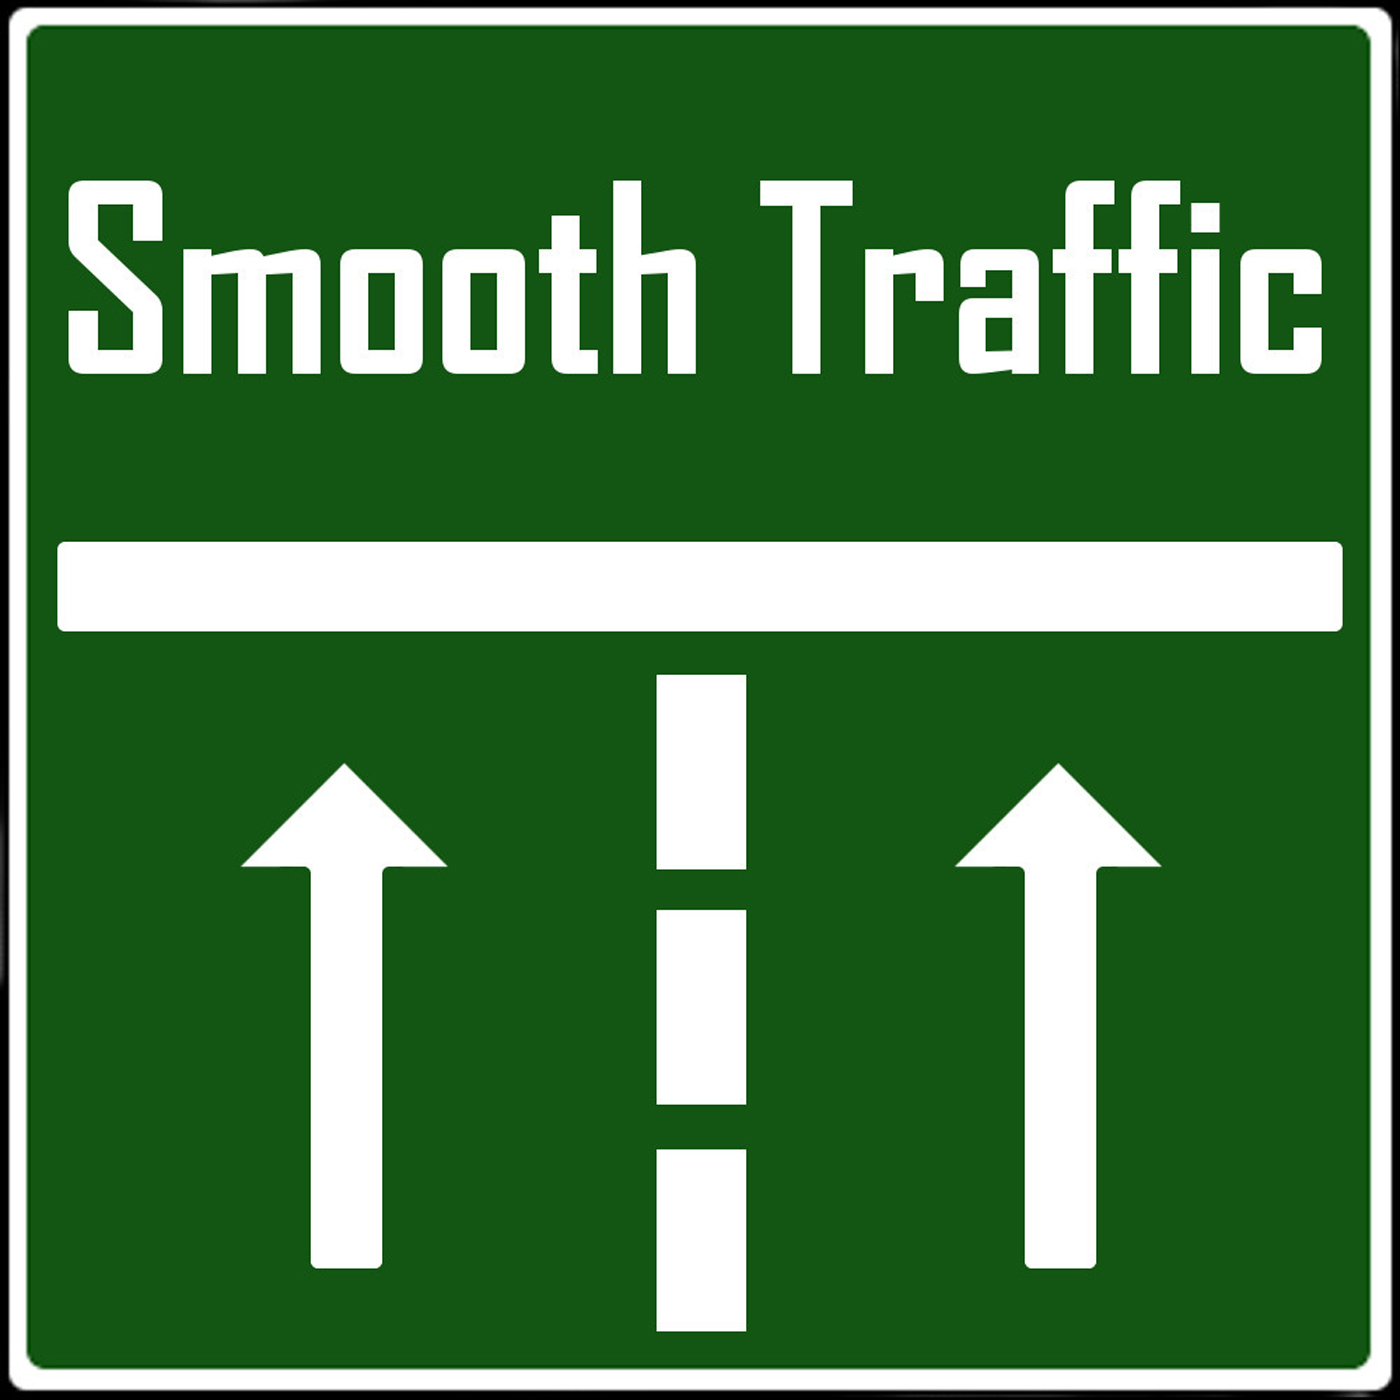 Smooth Traffic 1400.jpg